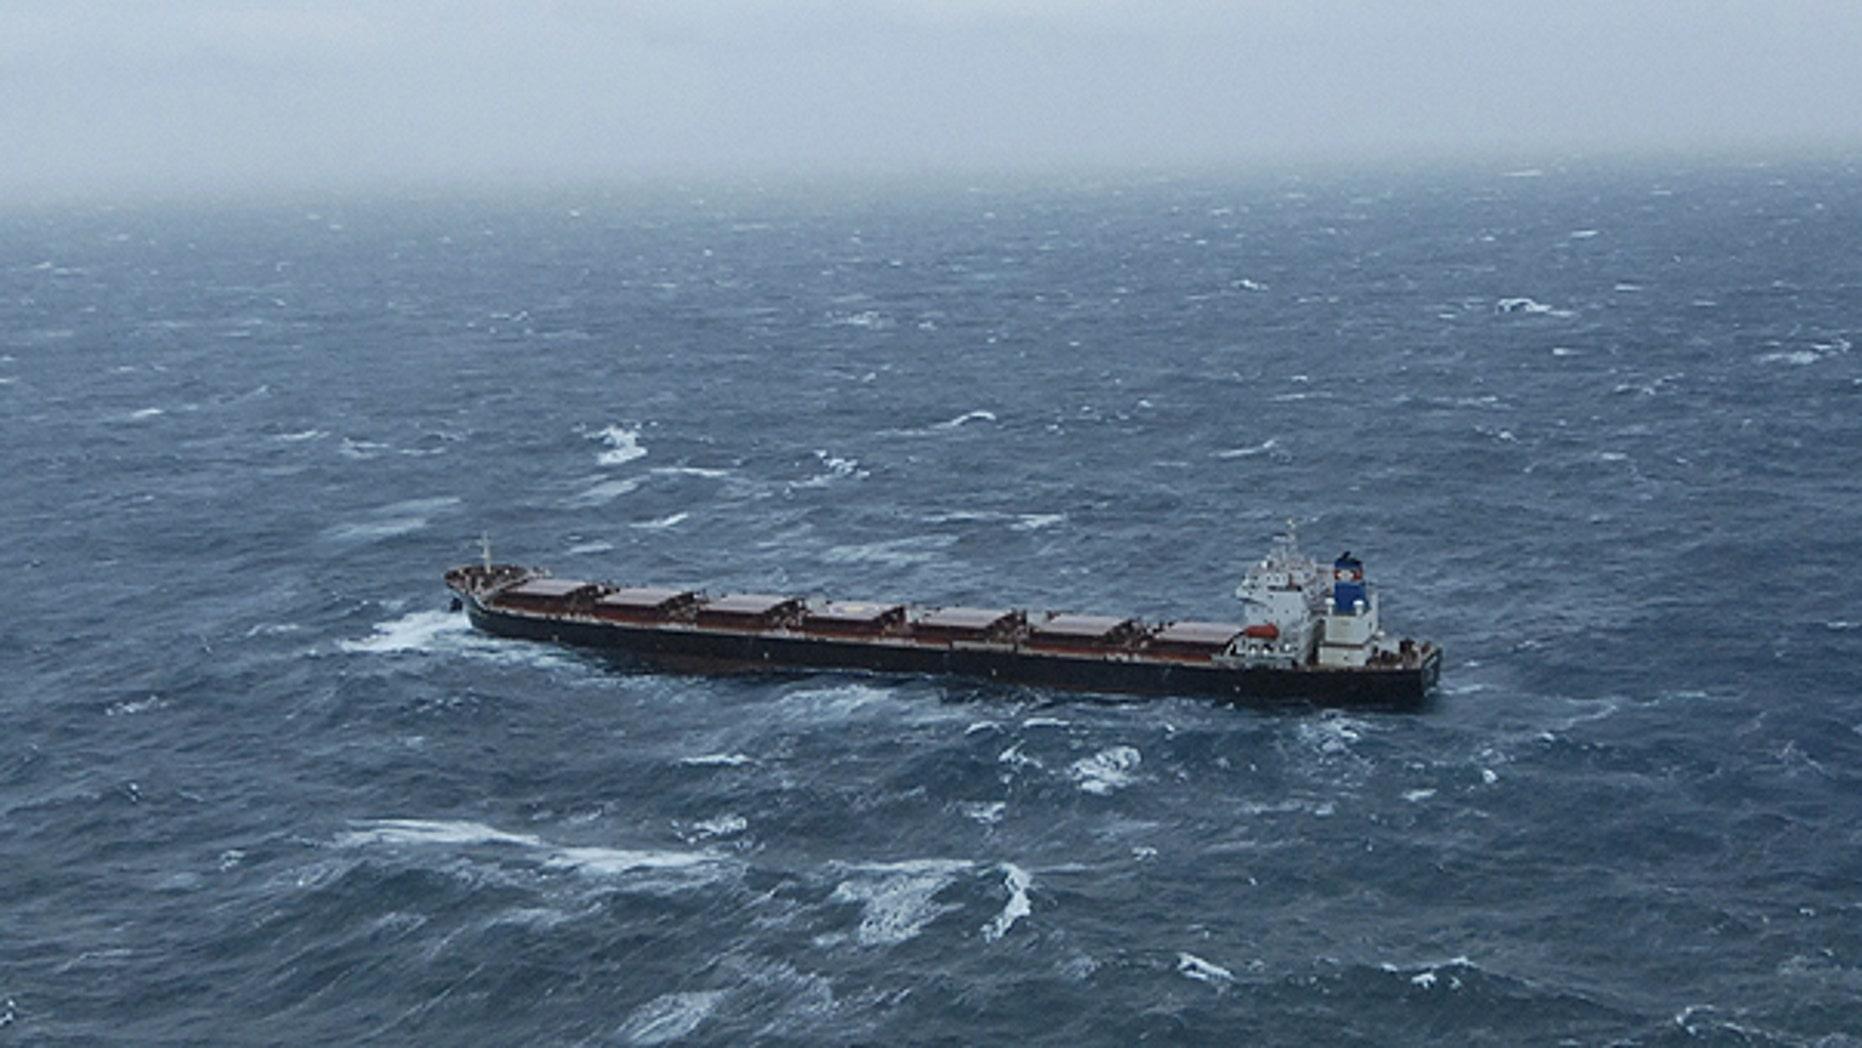 Dec. 3: This image provided by the U.S. Coast Guard shows the 738-foot tanker Golden Seas making 3.5 mph through 20-foot seas north of Adak Island Alaska.